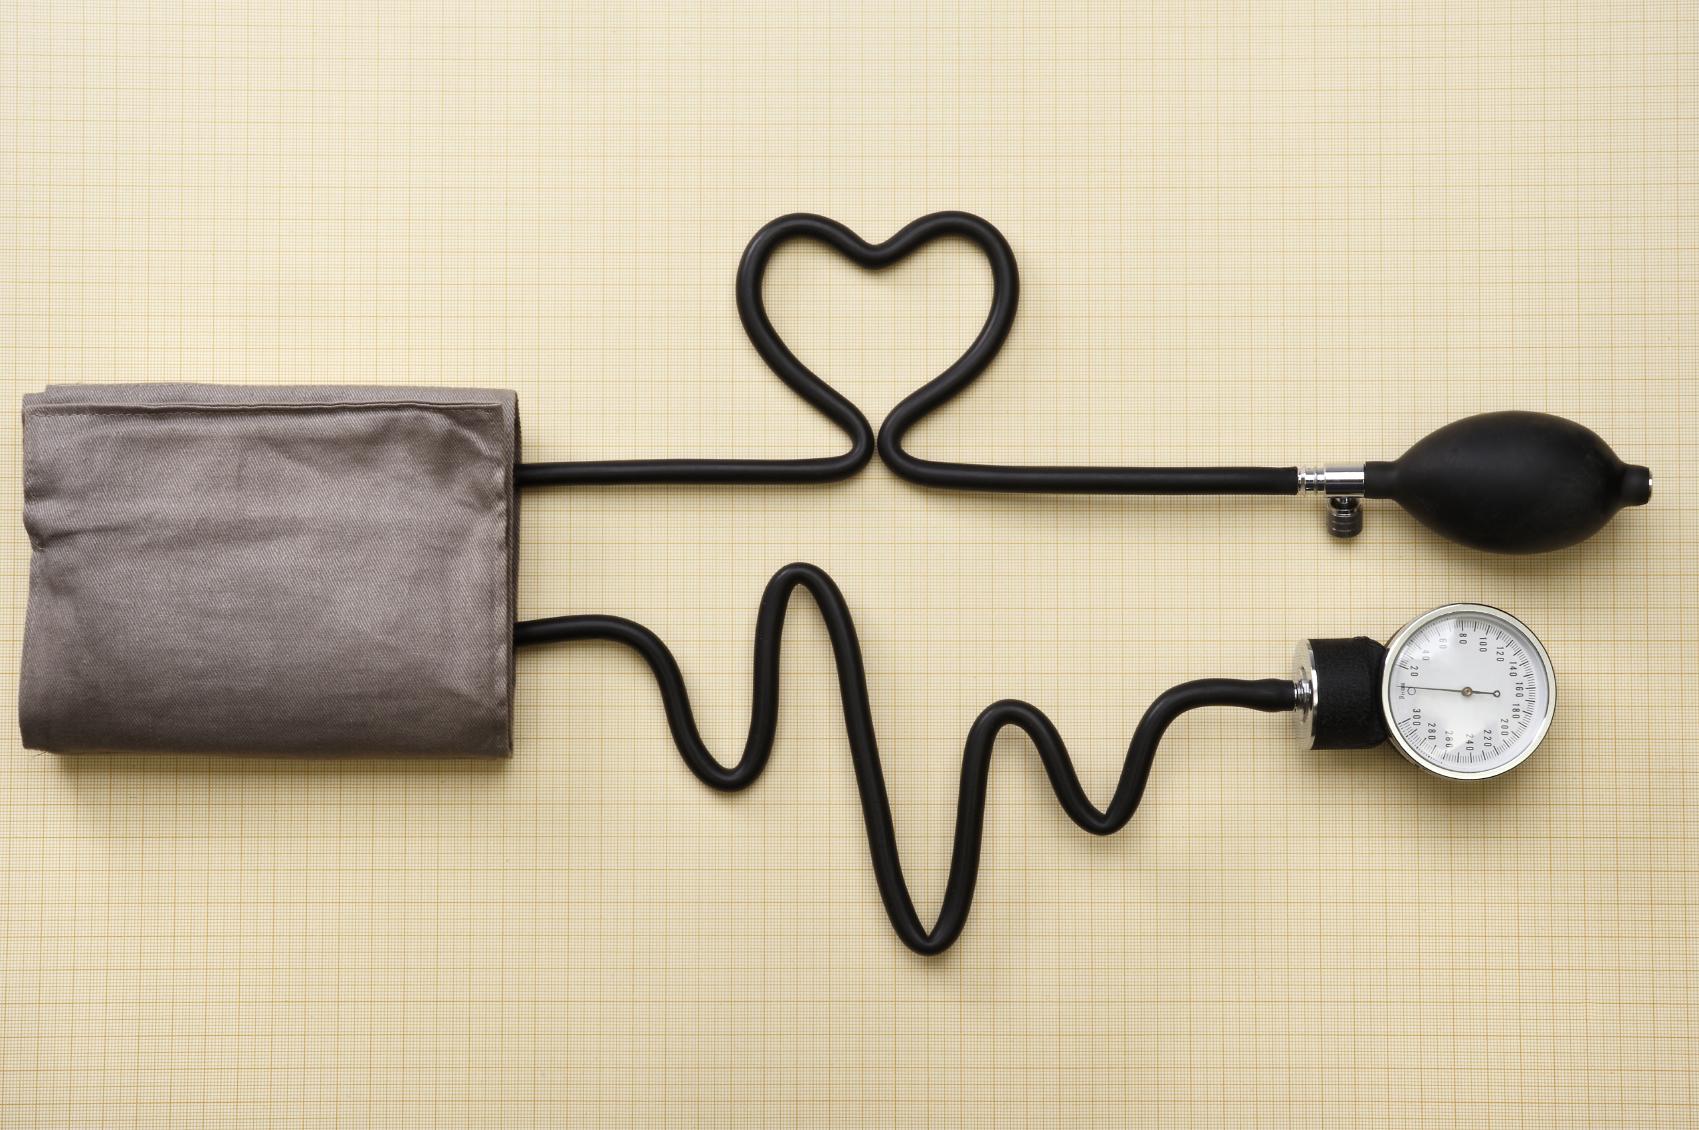 magas vérnyomás 2 fok mcb 10)